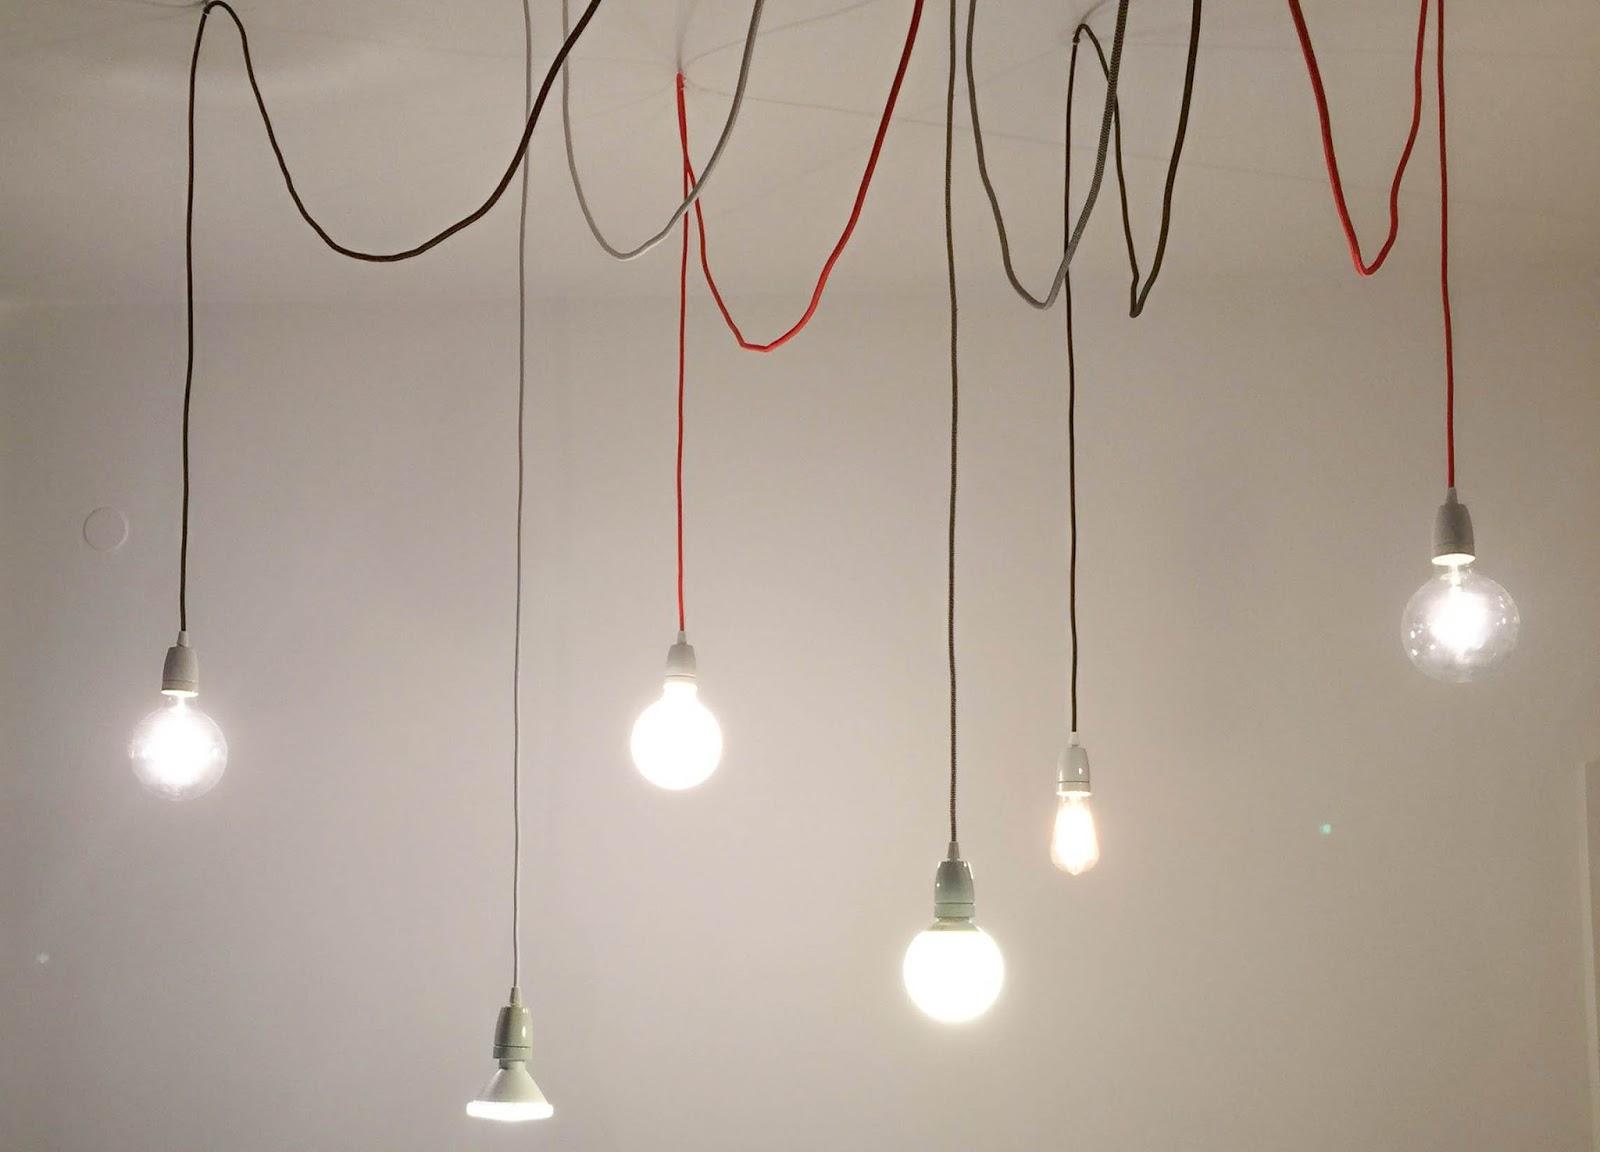 Cavi Per Lampadari A Sospensione.Rope Lampada Con Cavi Colorati In Tessuto Daniele Drigo